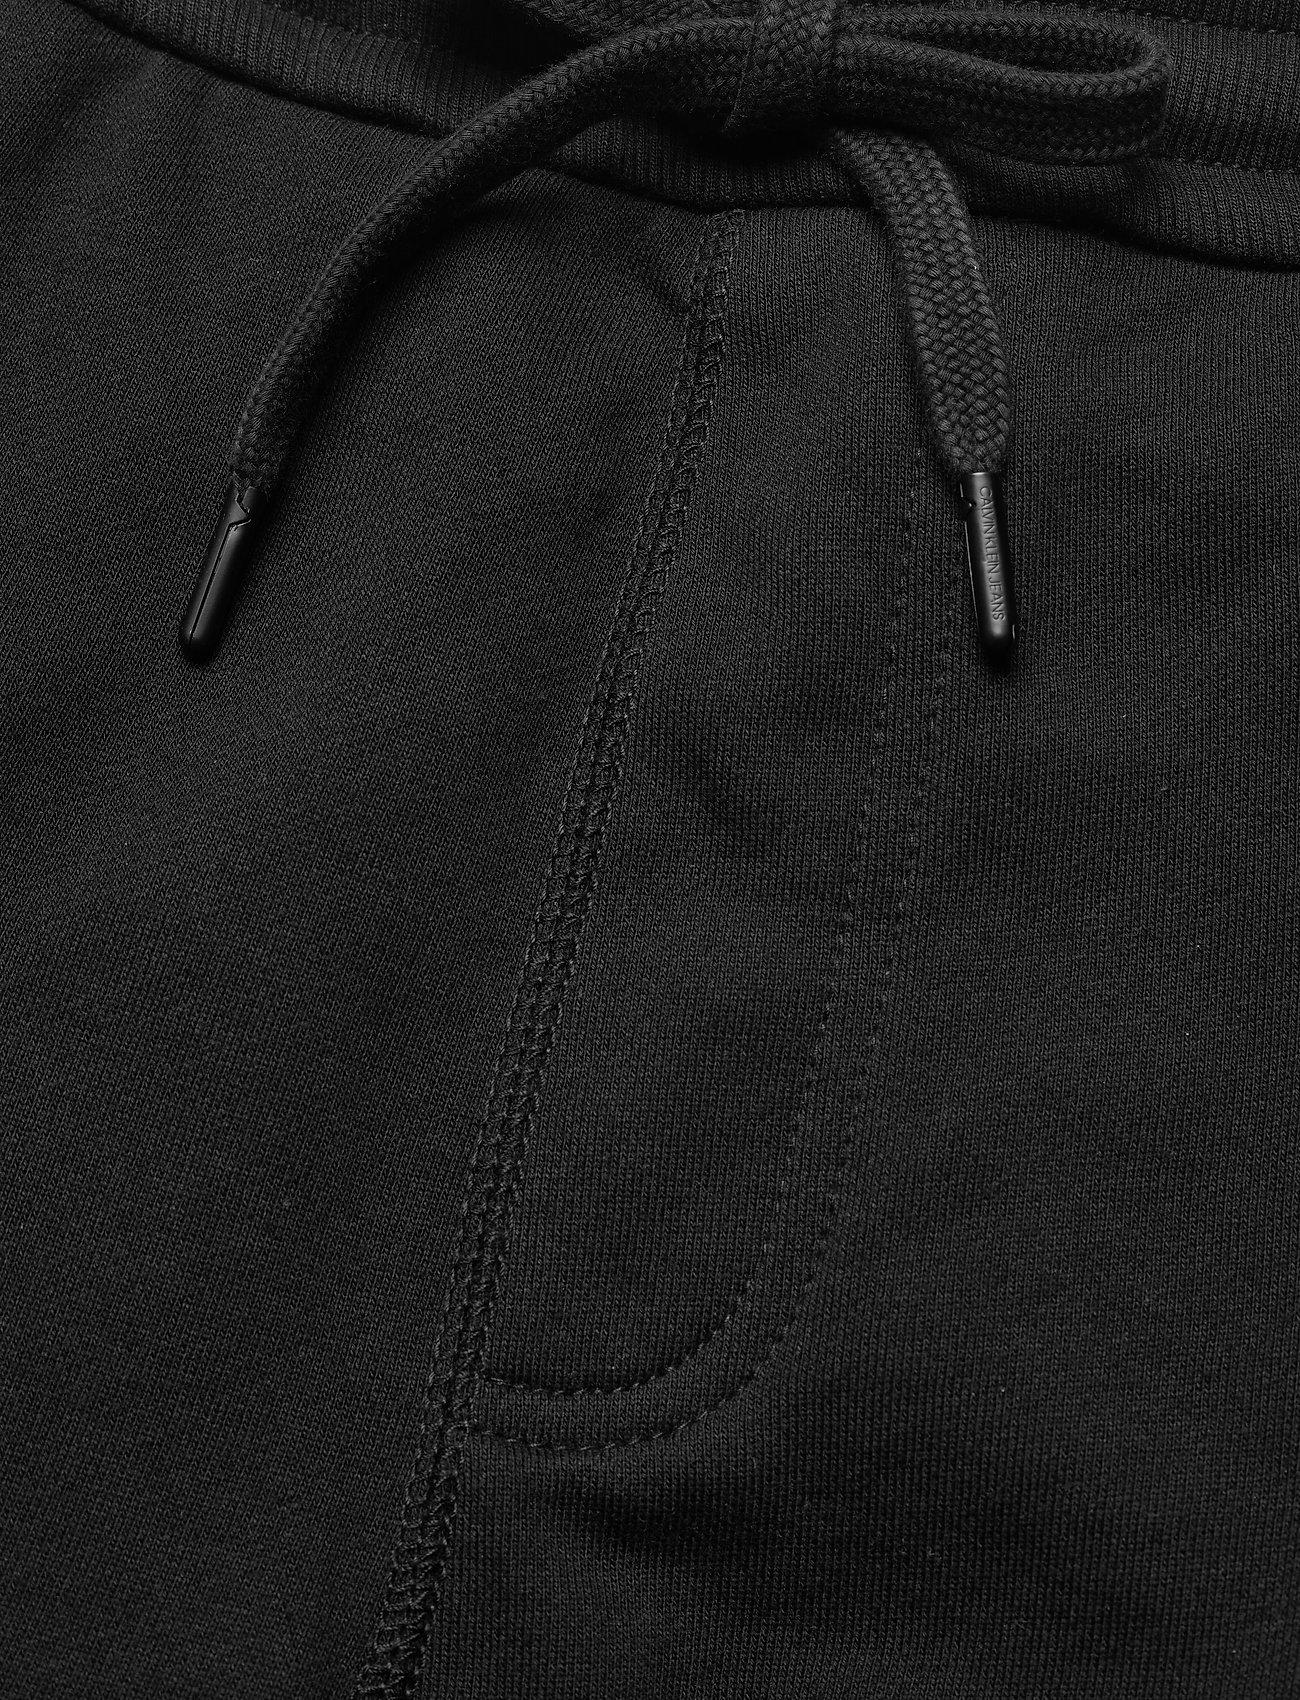 Calvin Klein Jeans - CARGO BADGE FLEECE PANT - cargobroek - ck black - 4